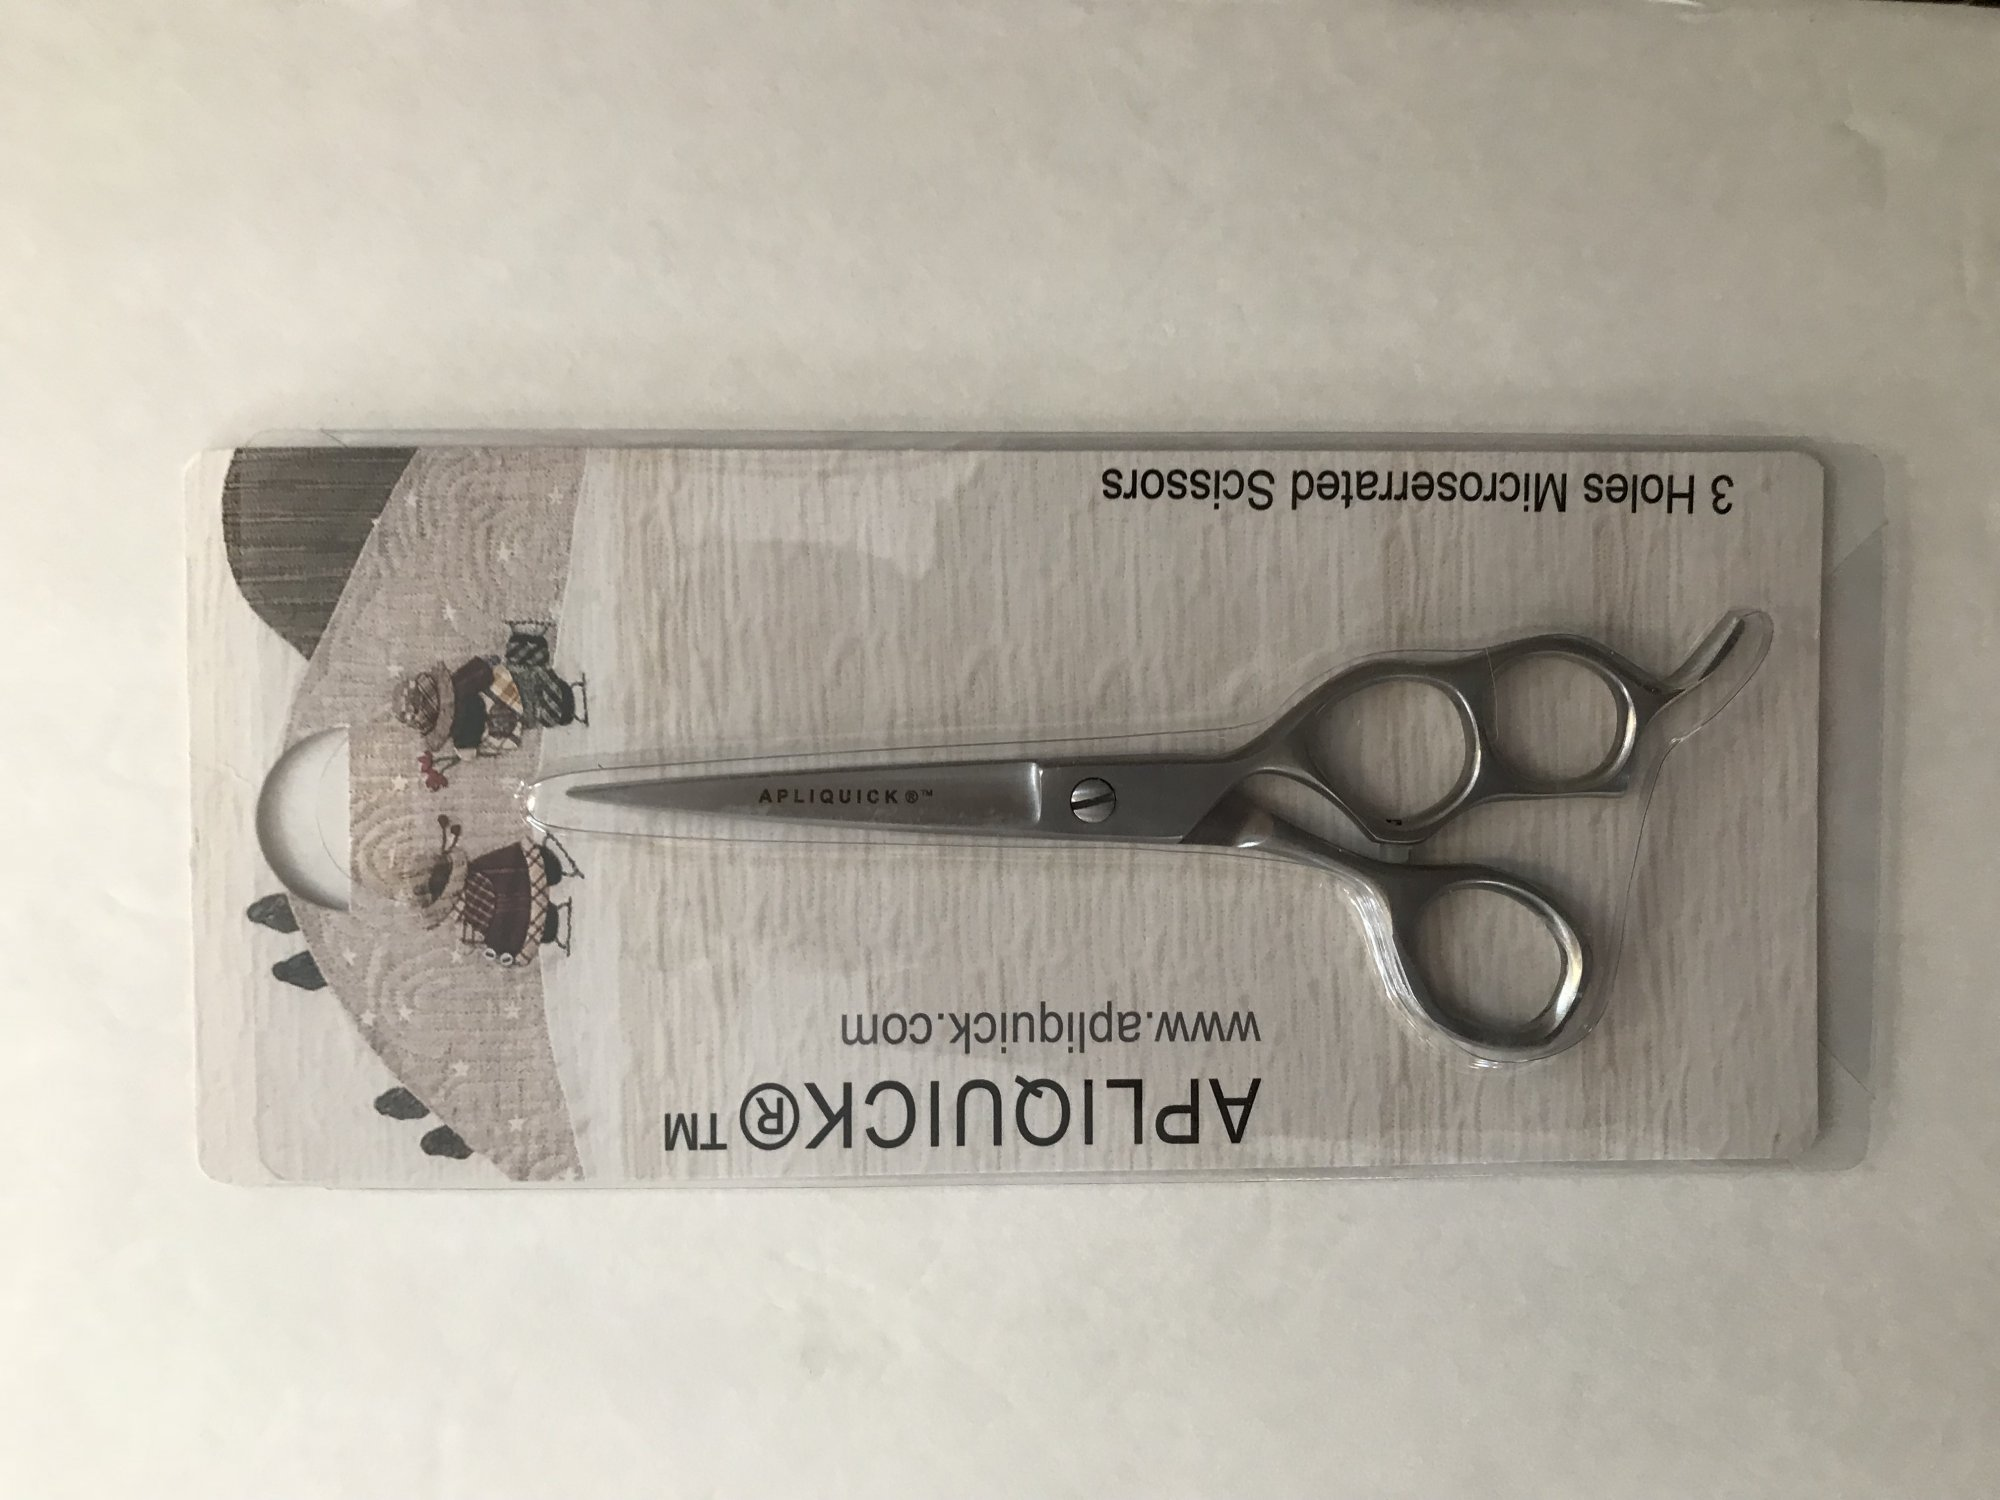 Apliquick 3 hole Microserrated Small Scissors